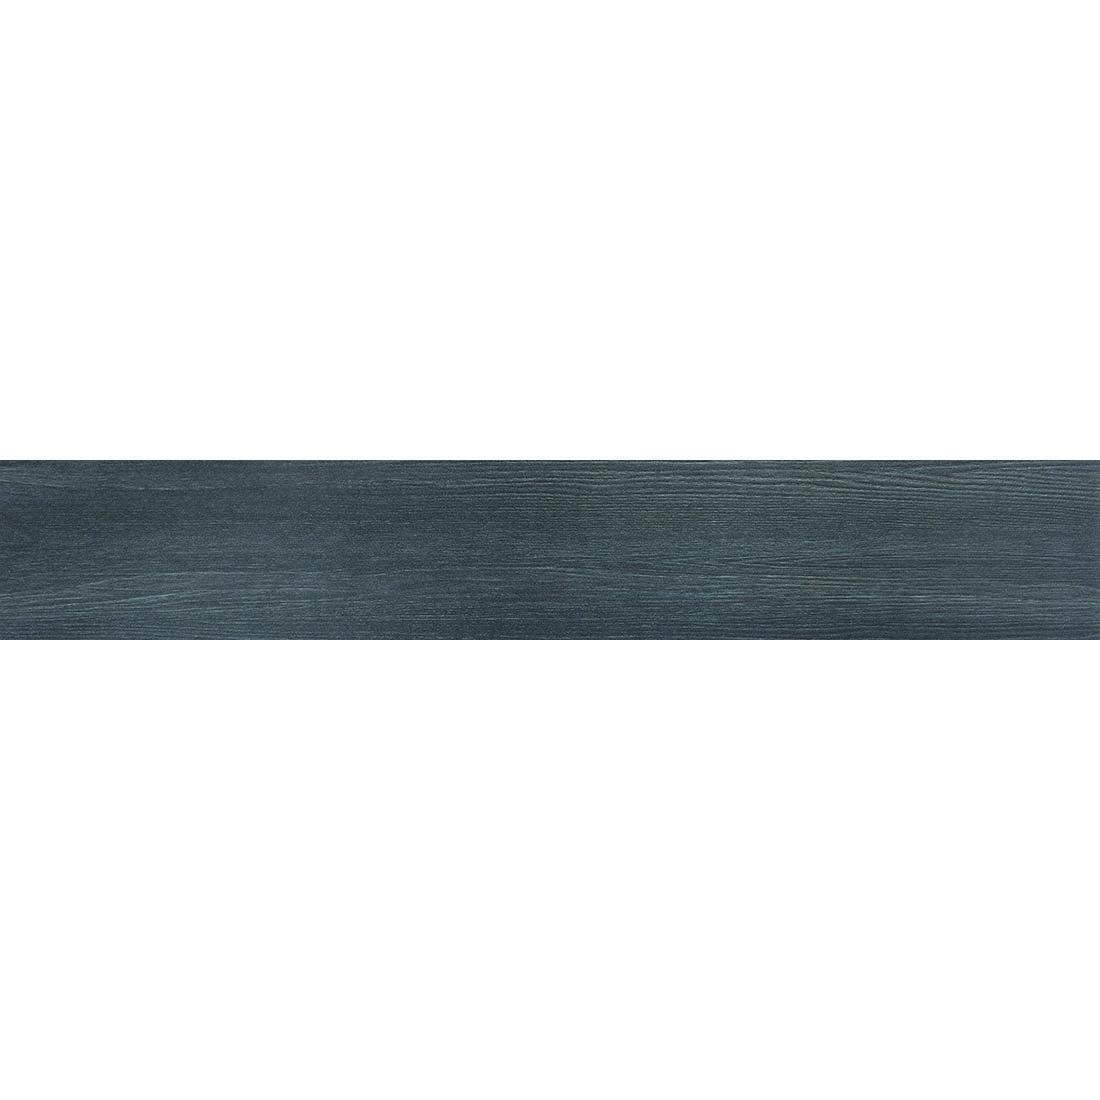 Hardwood 20x120 Negro 1